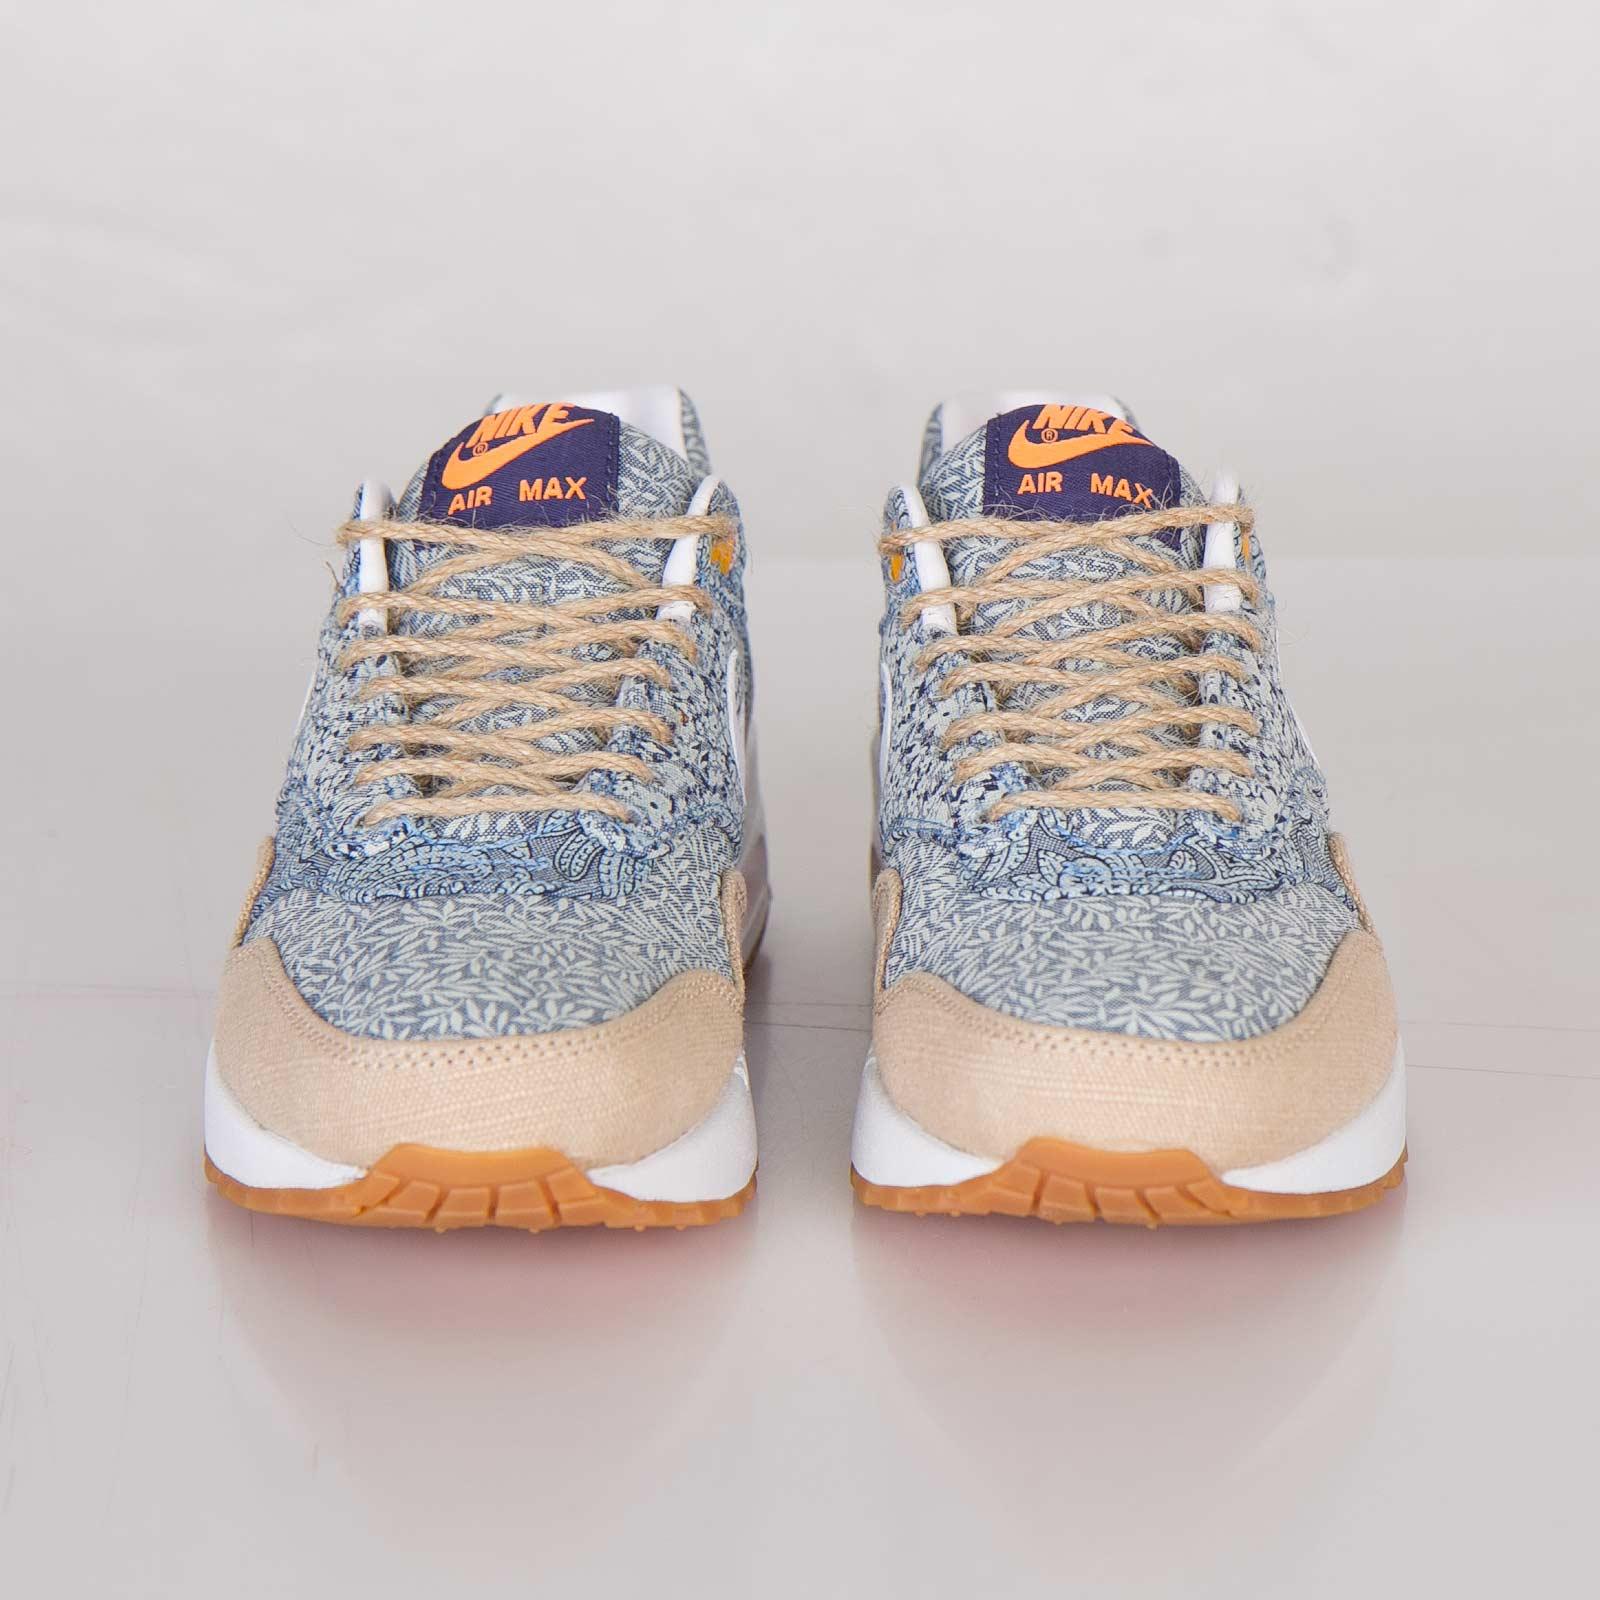 Nike Wmns Air Max 1 Liberty QS 540855 400 Sneakersnstuff